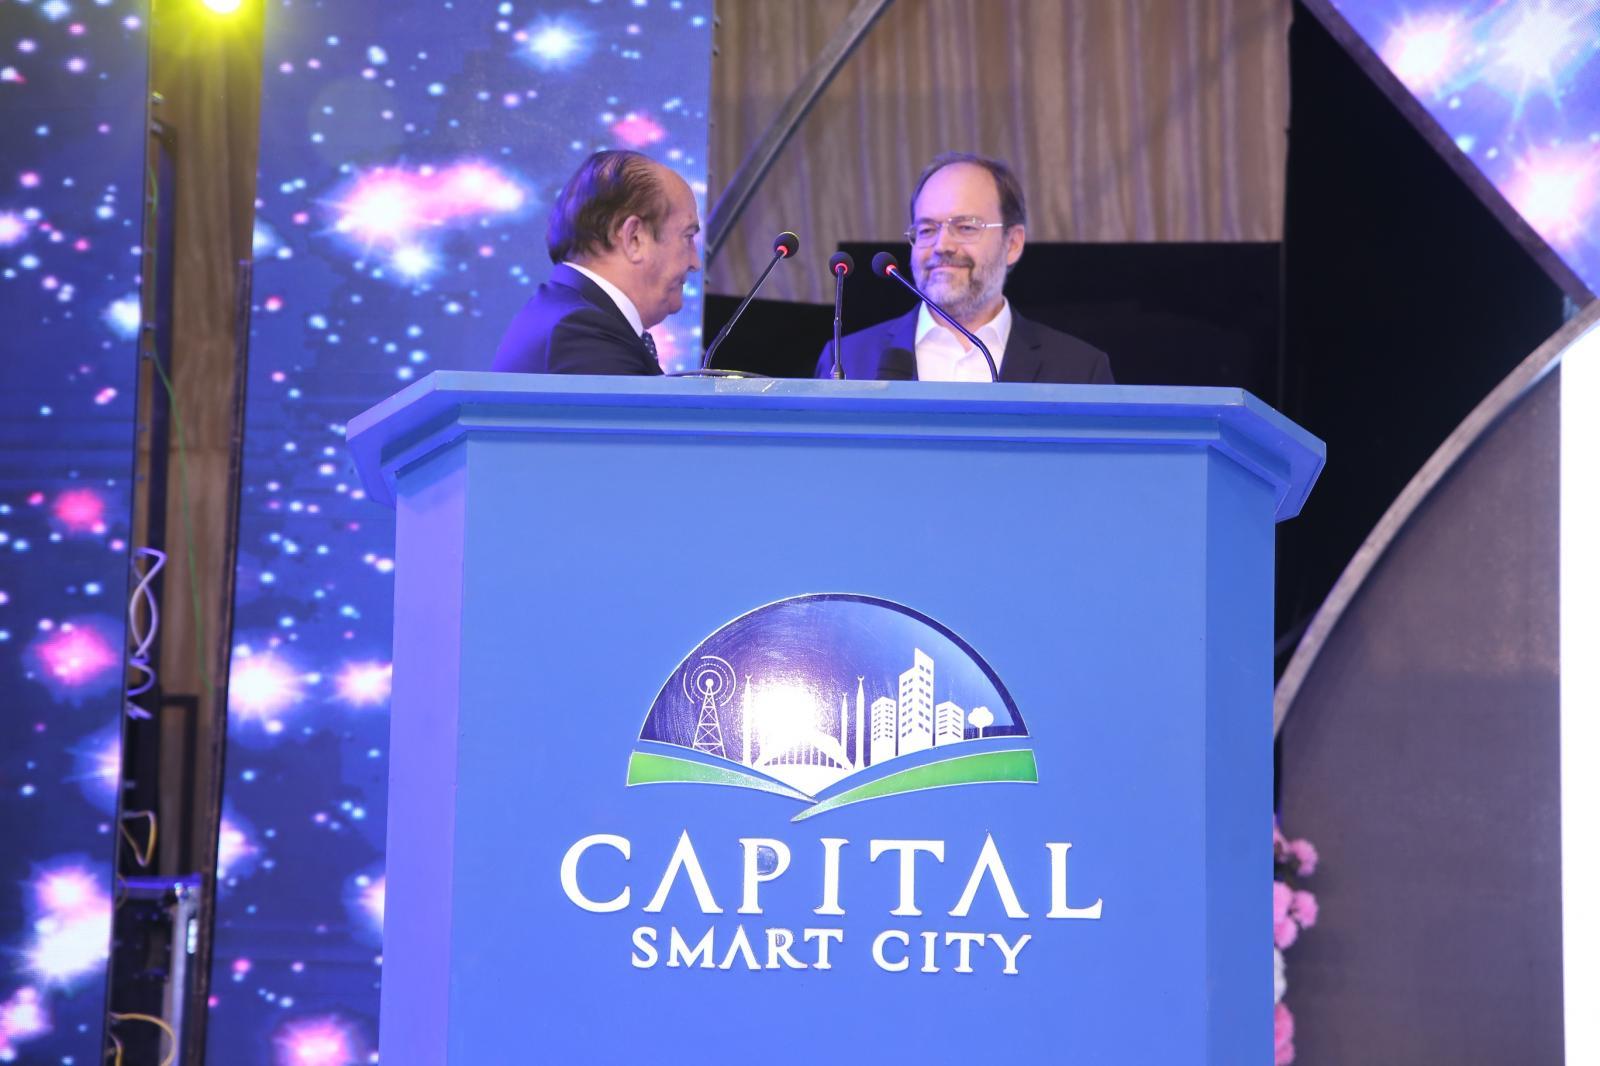 1st Balloting of Capital Smart City